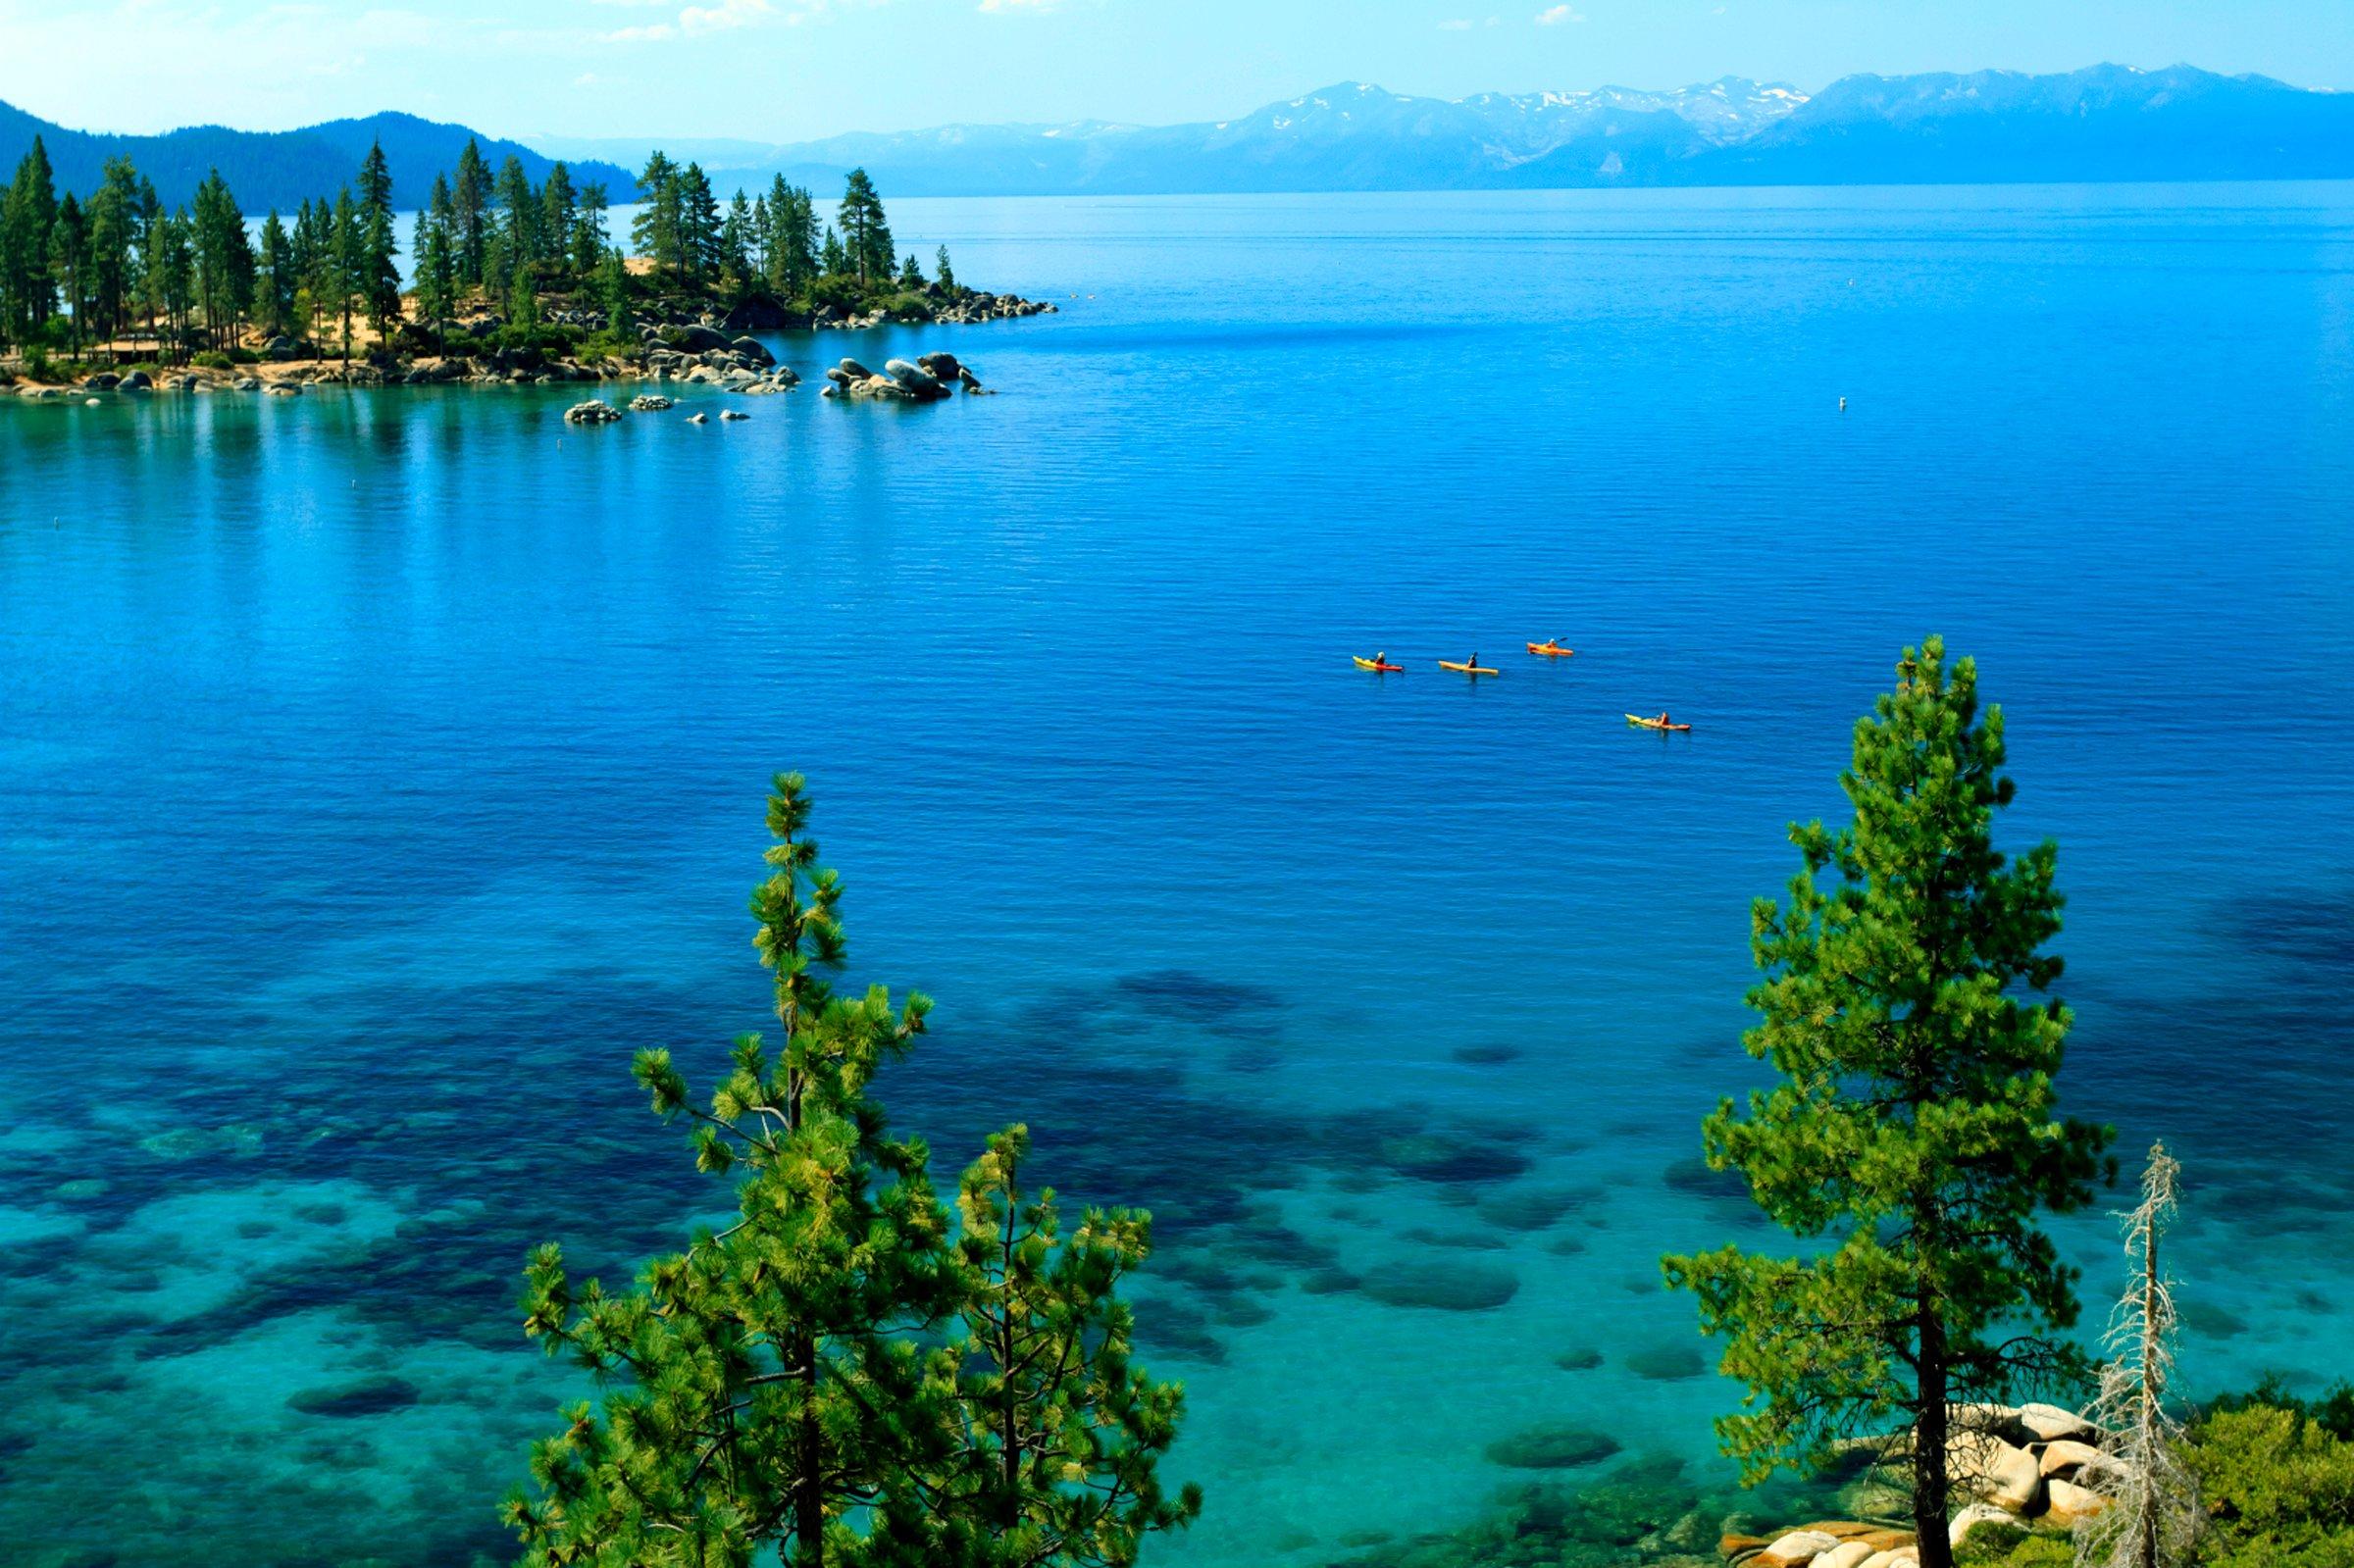 Clearest Water In The World Lake Tahoe Wallpaper Emerald Bay Wallpapersafari